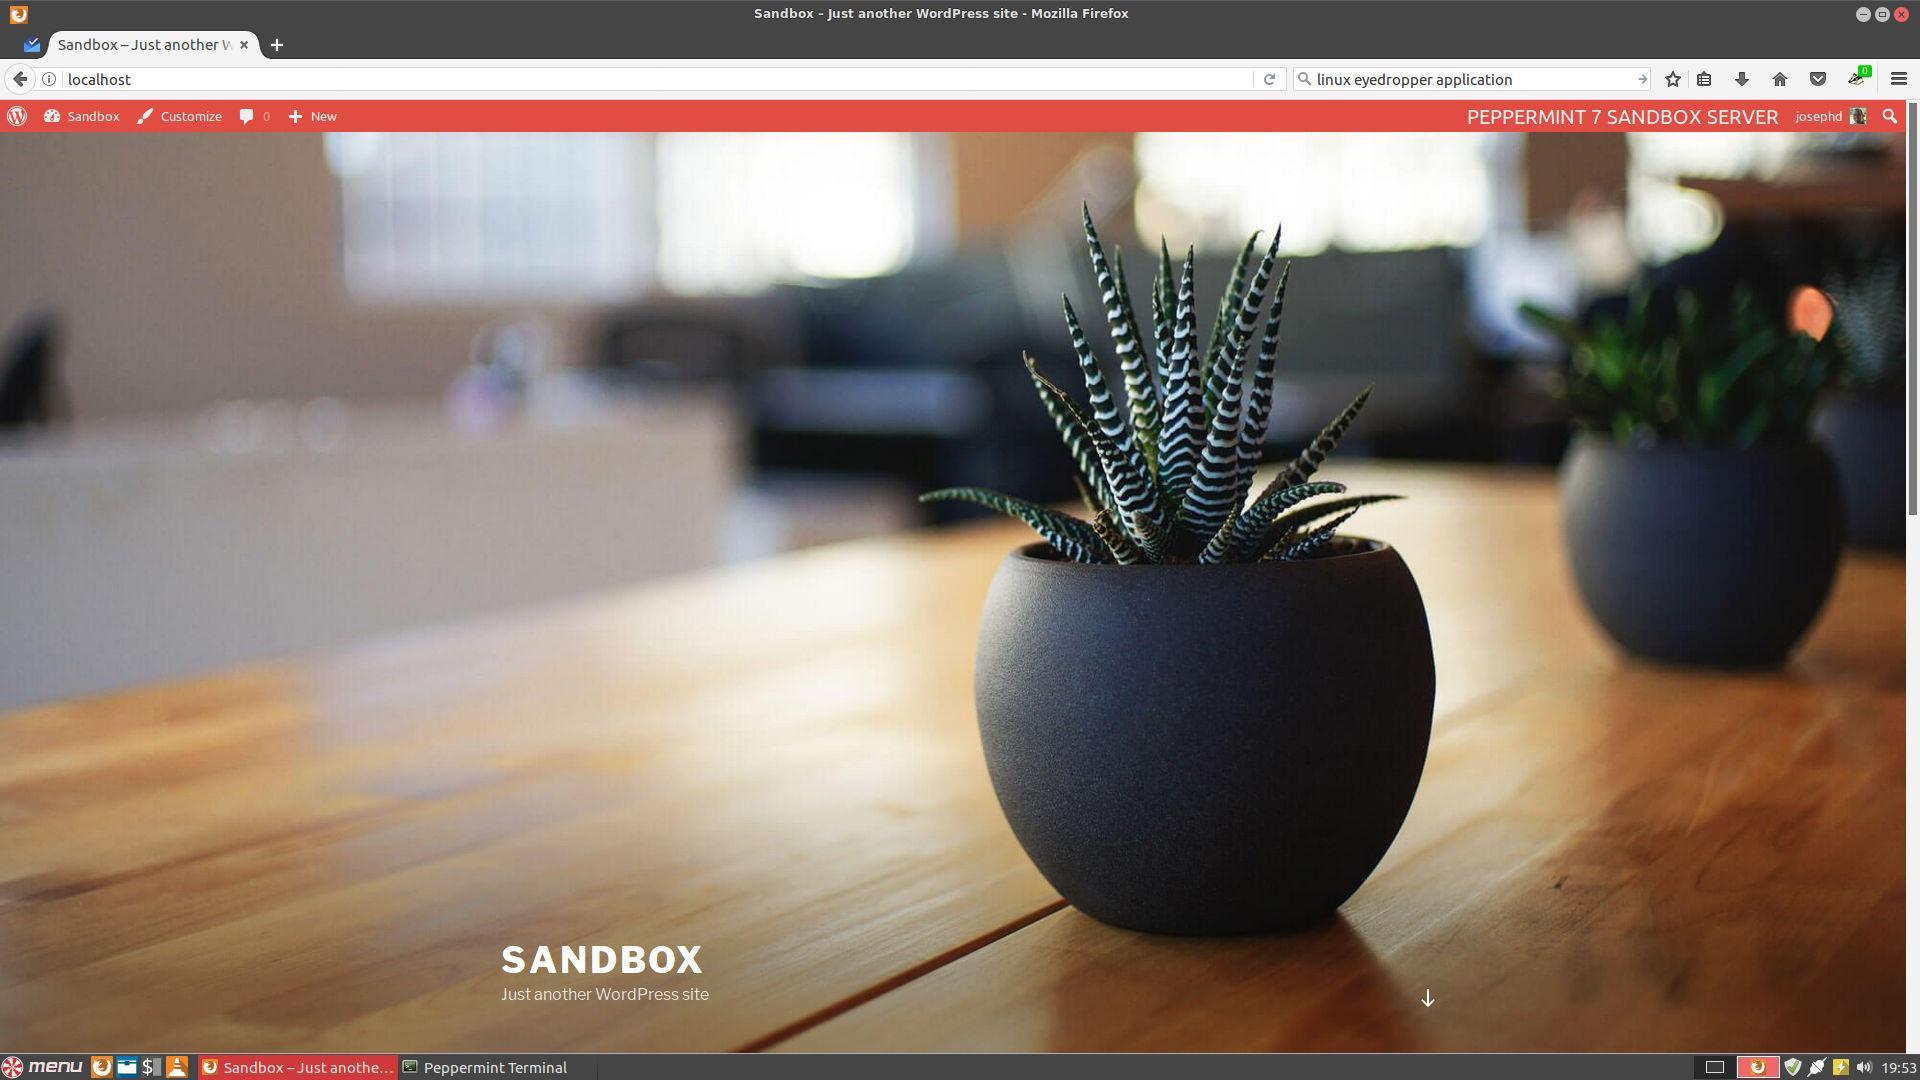 Peppermint-sandbox-server